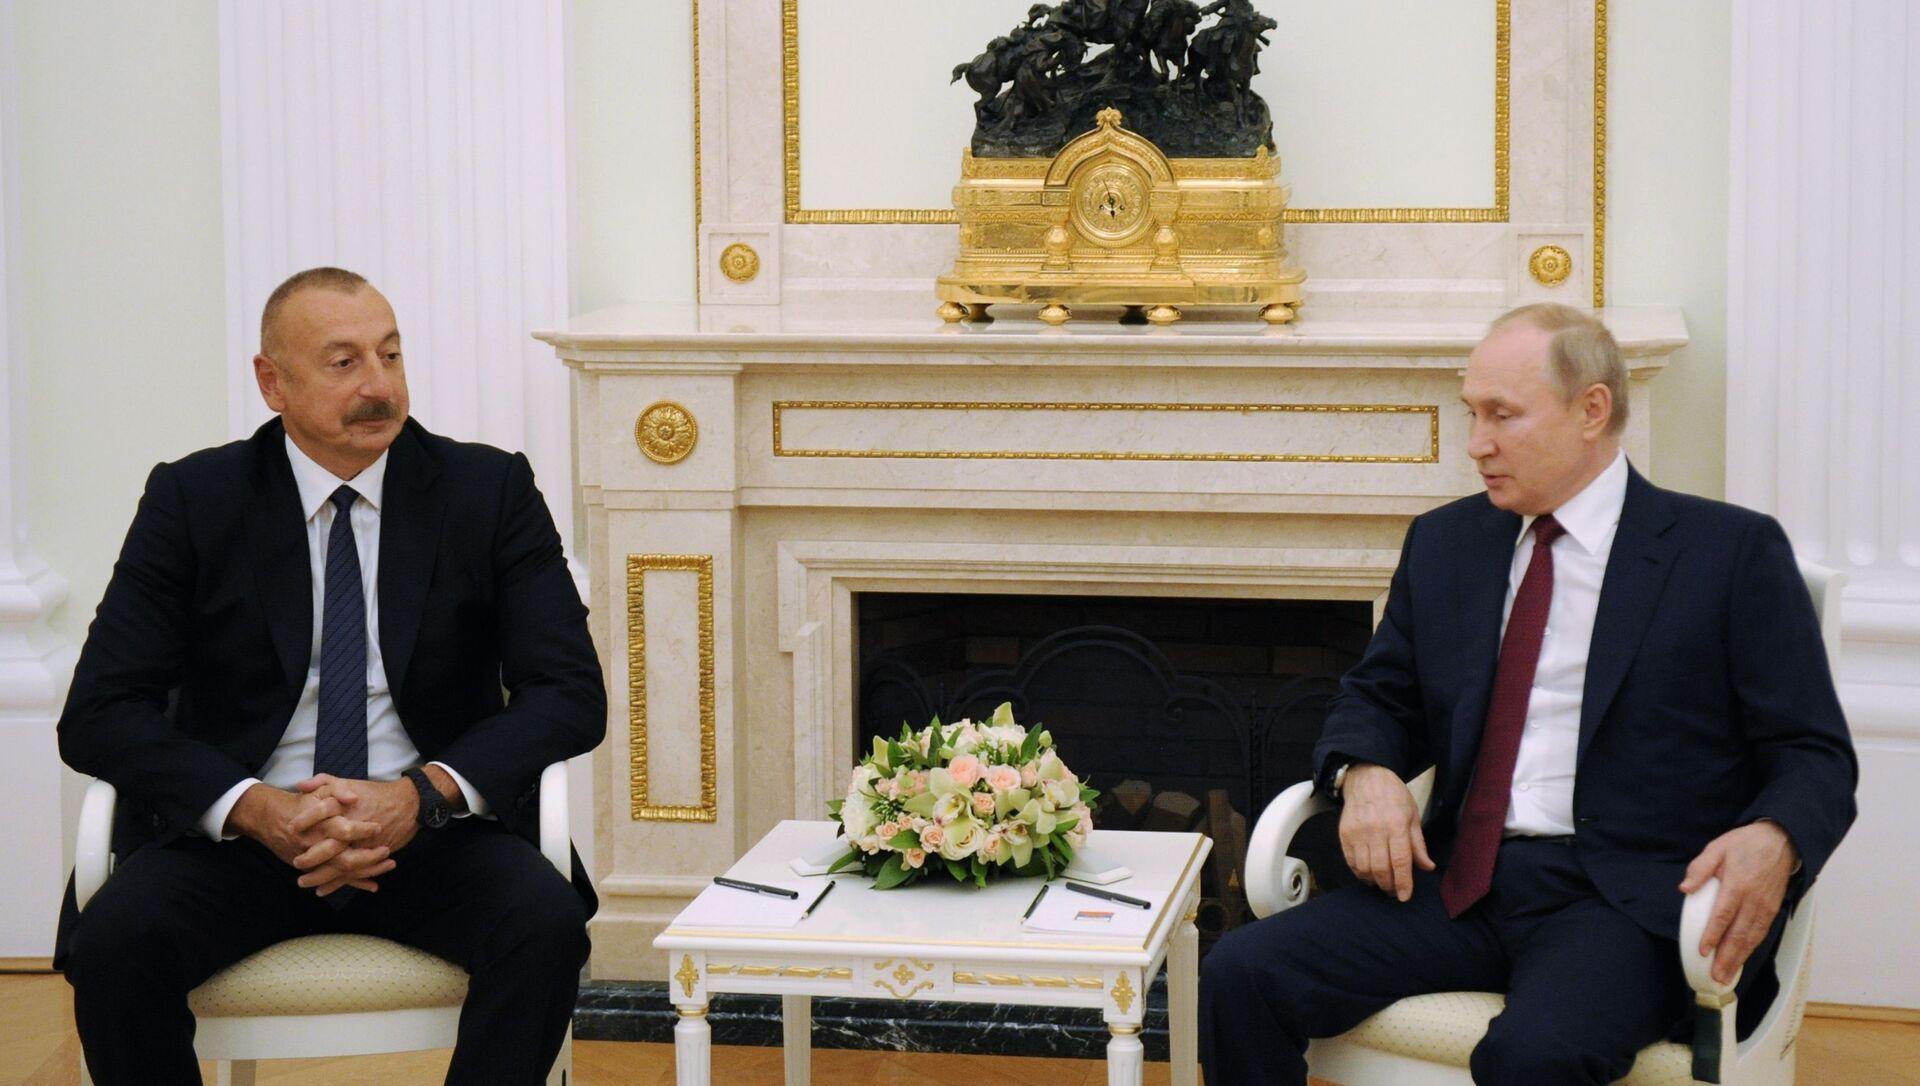 Президент Азербайджана Ильхам Алиев и президент России Владимир Путин, фото из архива - Sputnik Азербайджан, 1920, 21.09.2021